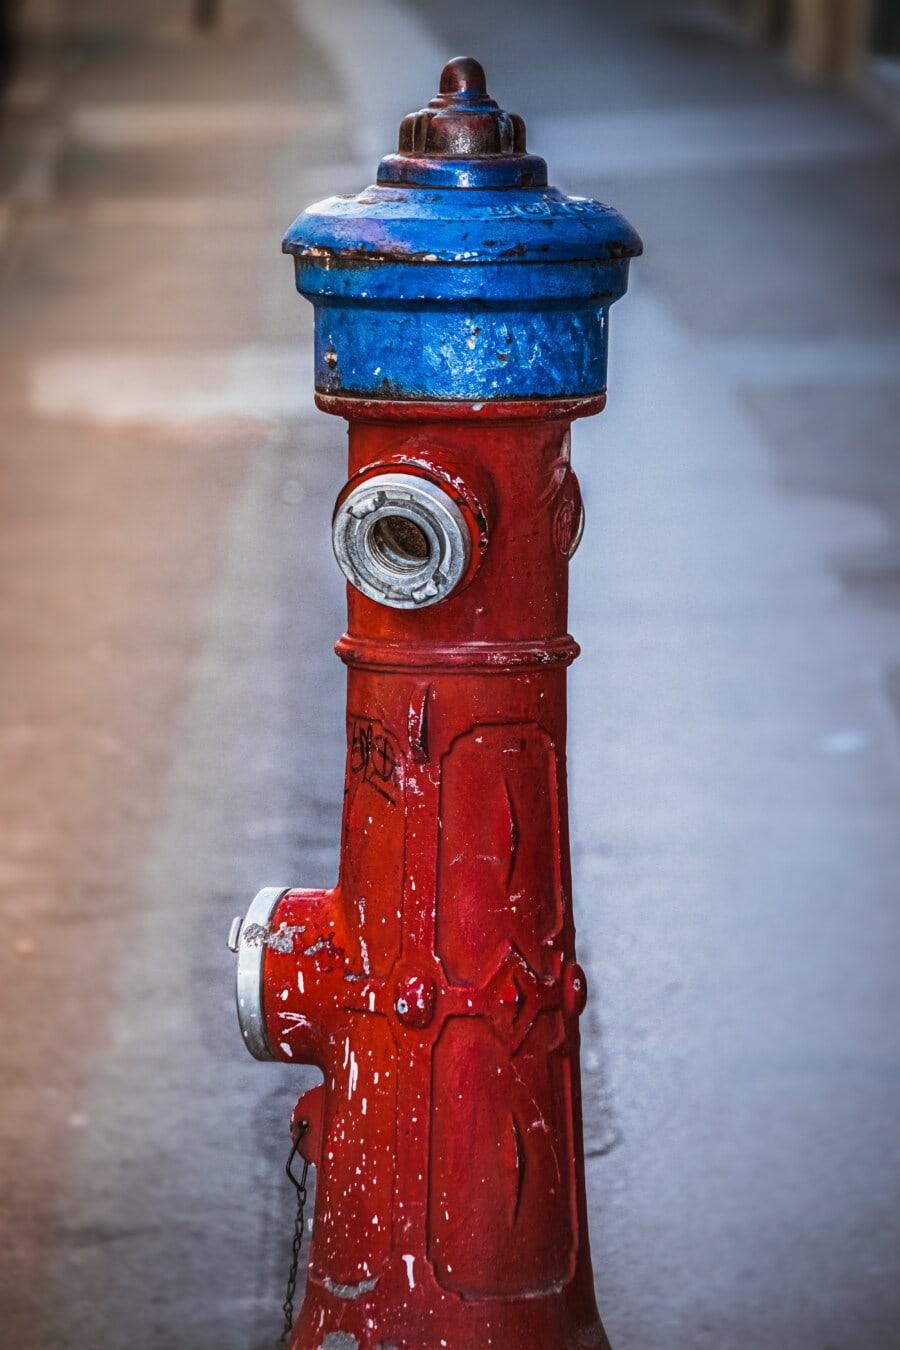 Hydrant, dunkelrot, Klassiker, alt, Wasserhahn, Antik, Stahl, Retro, Straße, dreckig